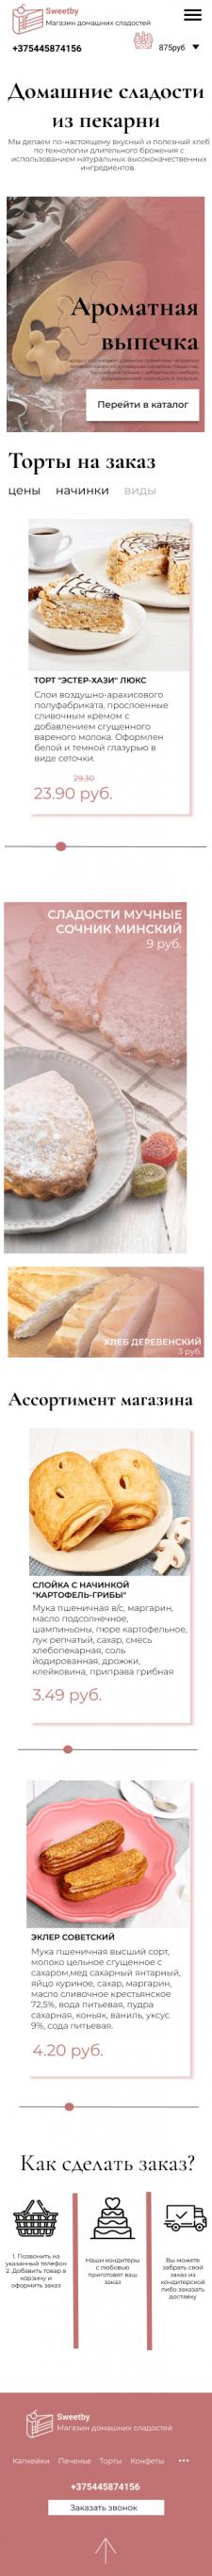 Дизайн сайта пекарни-2